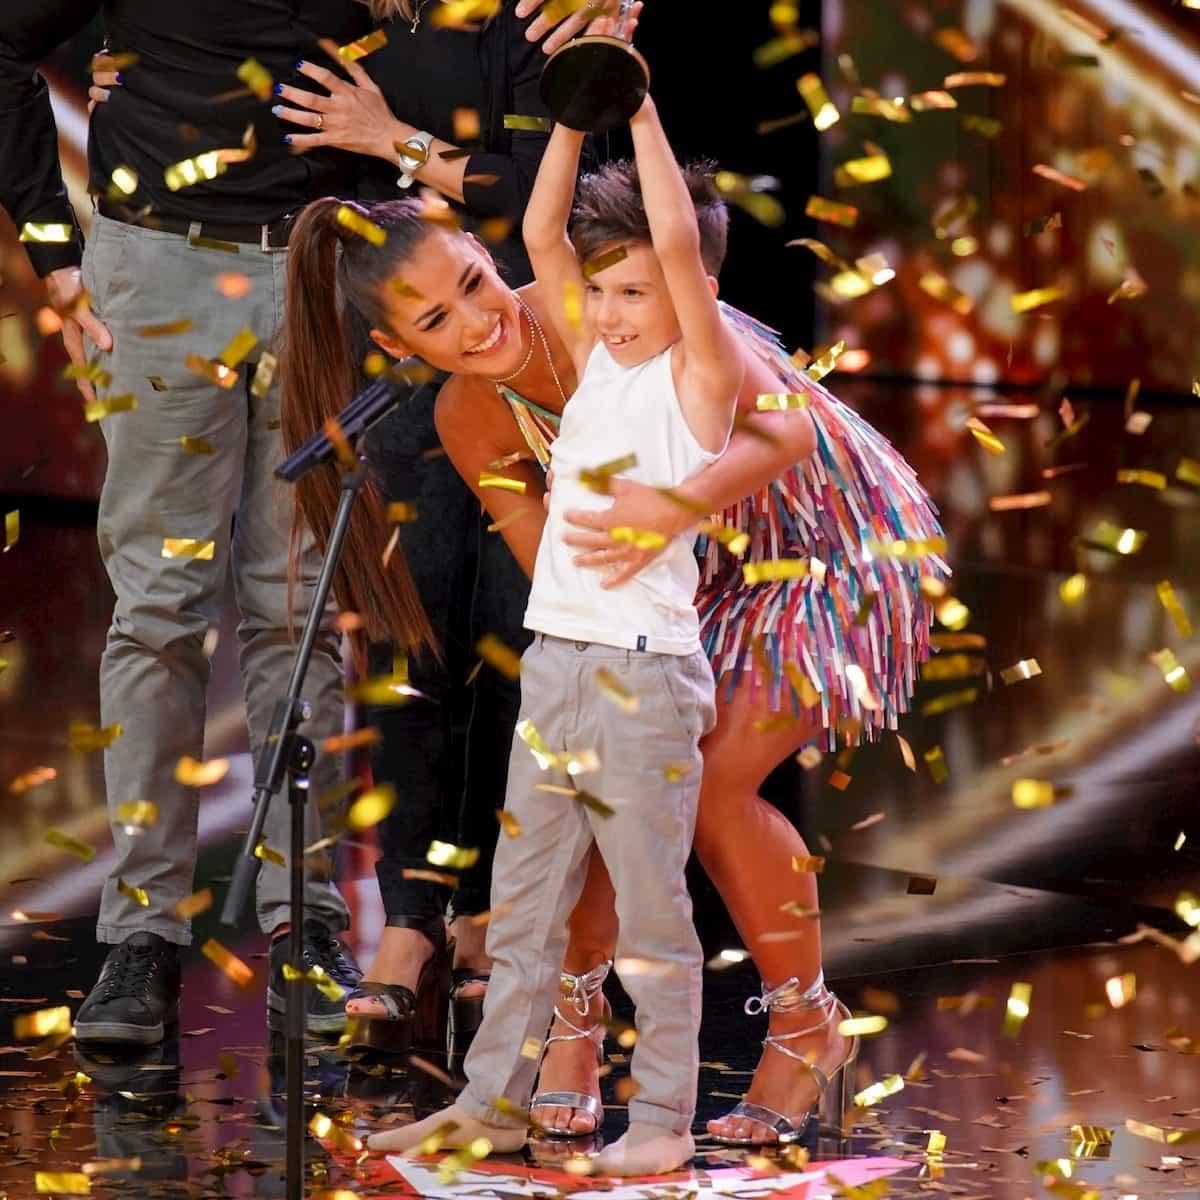 Mirko Casella im Finale Supertalent am 21.12.2019 - hier mit Sarah Lombardi